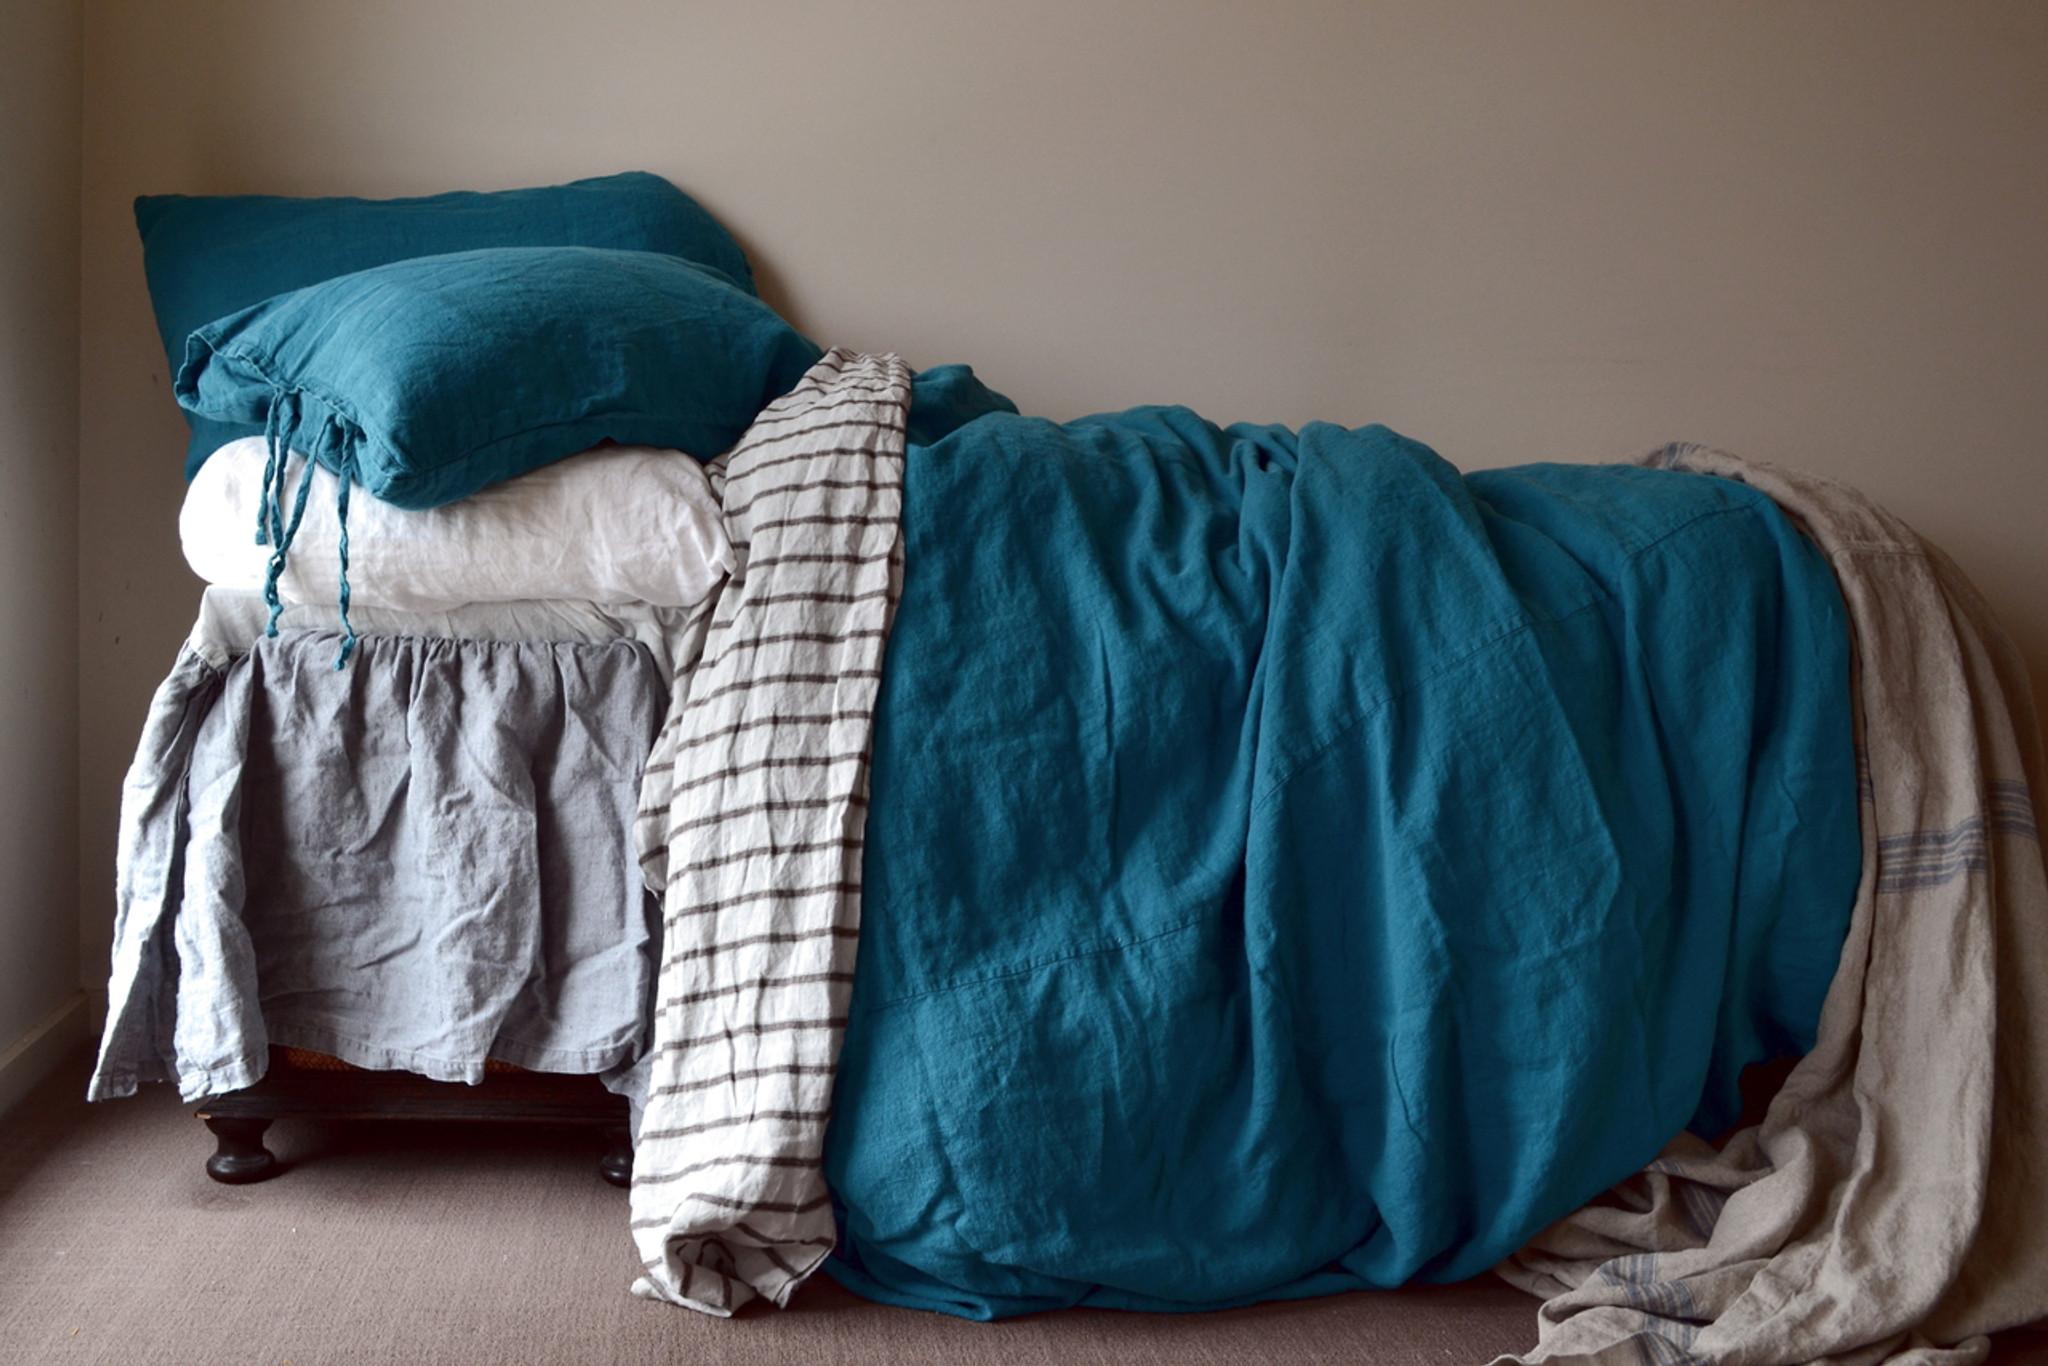 dark teal heavy weight natural linen duvet quilt cover. Black Bedroom Furniture Sets. Home Design Ideas